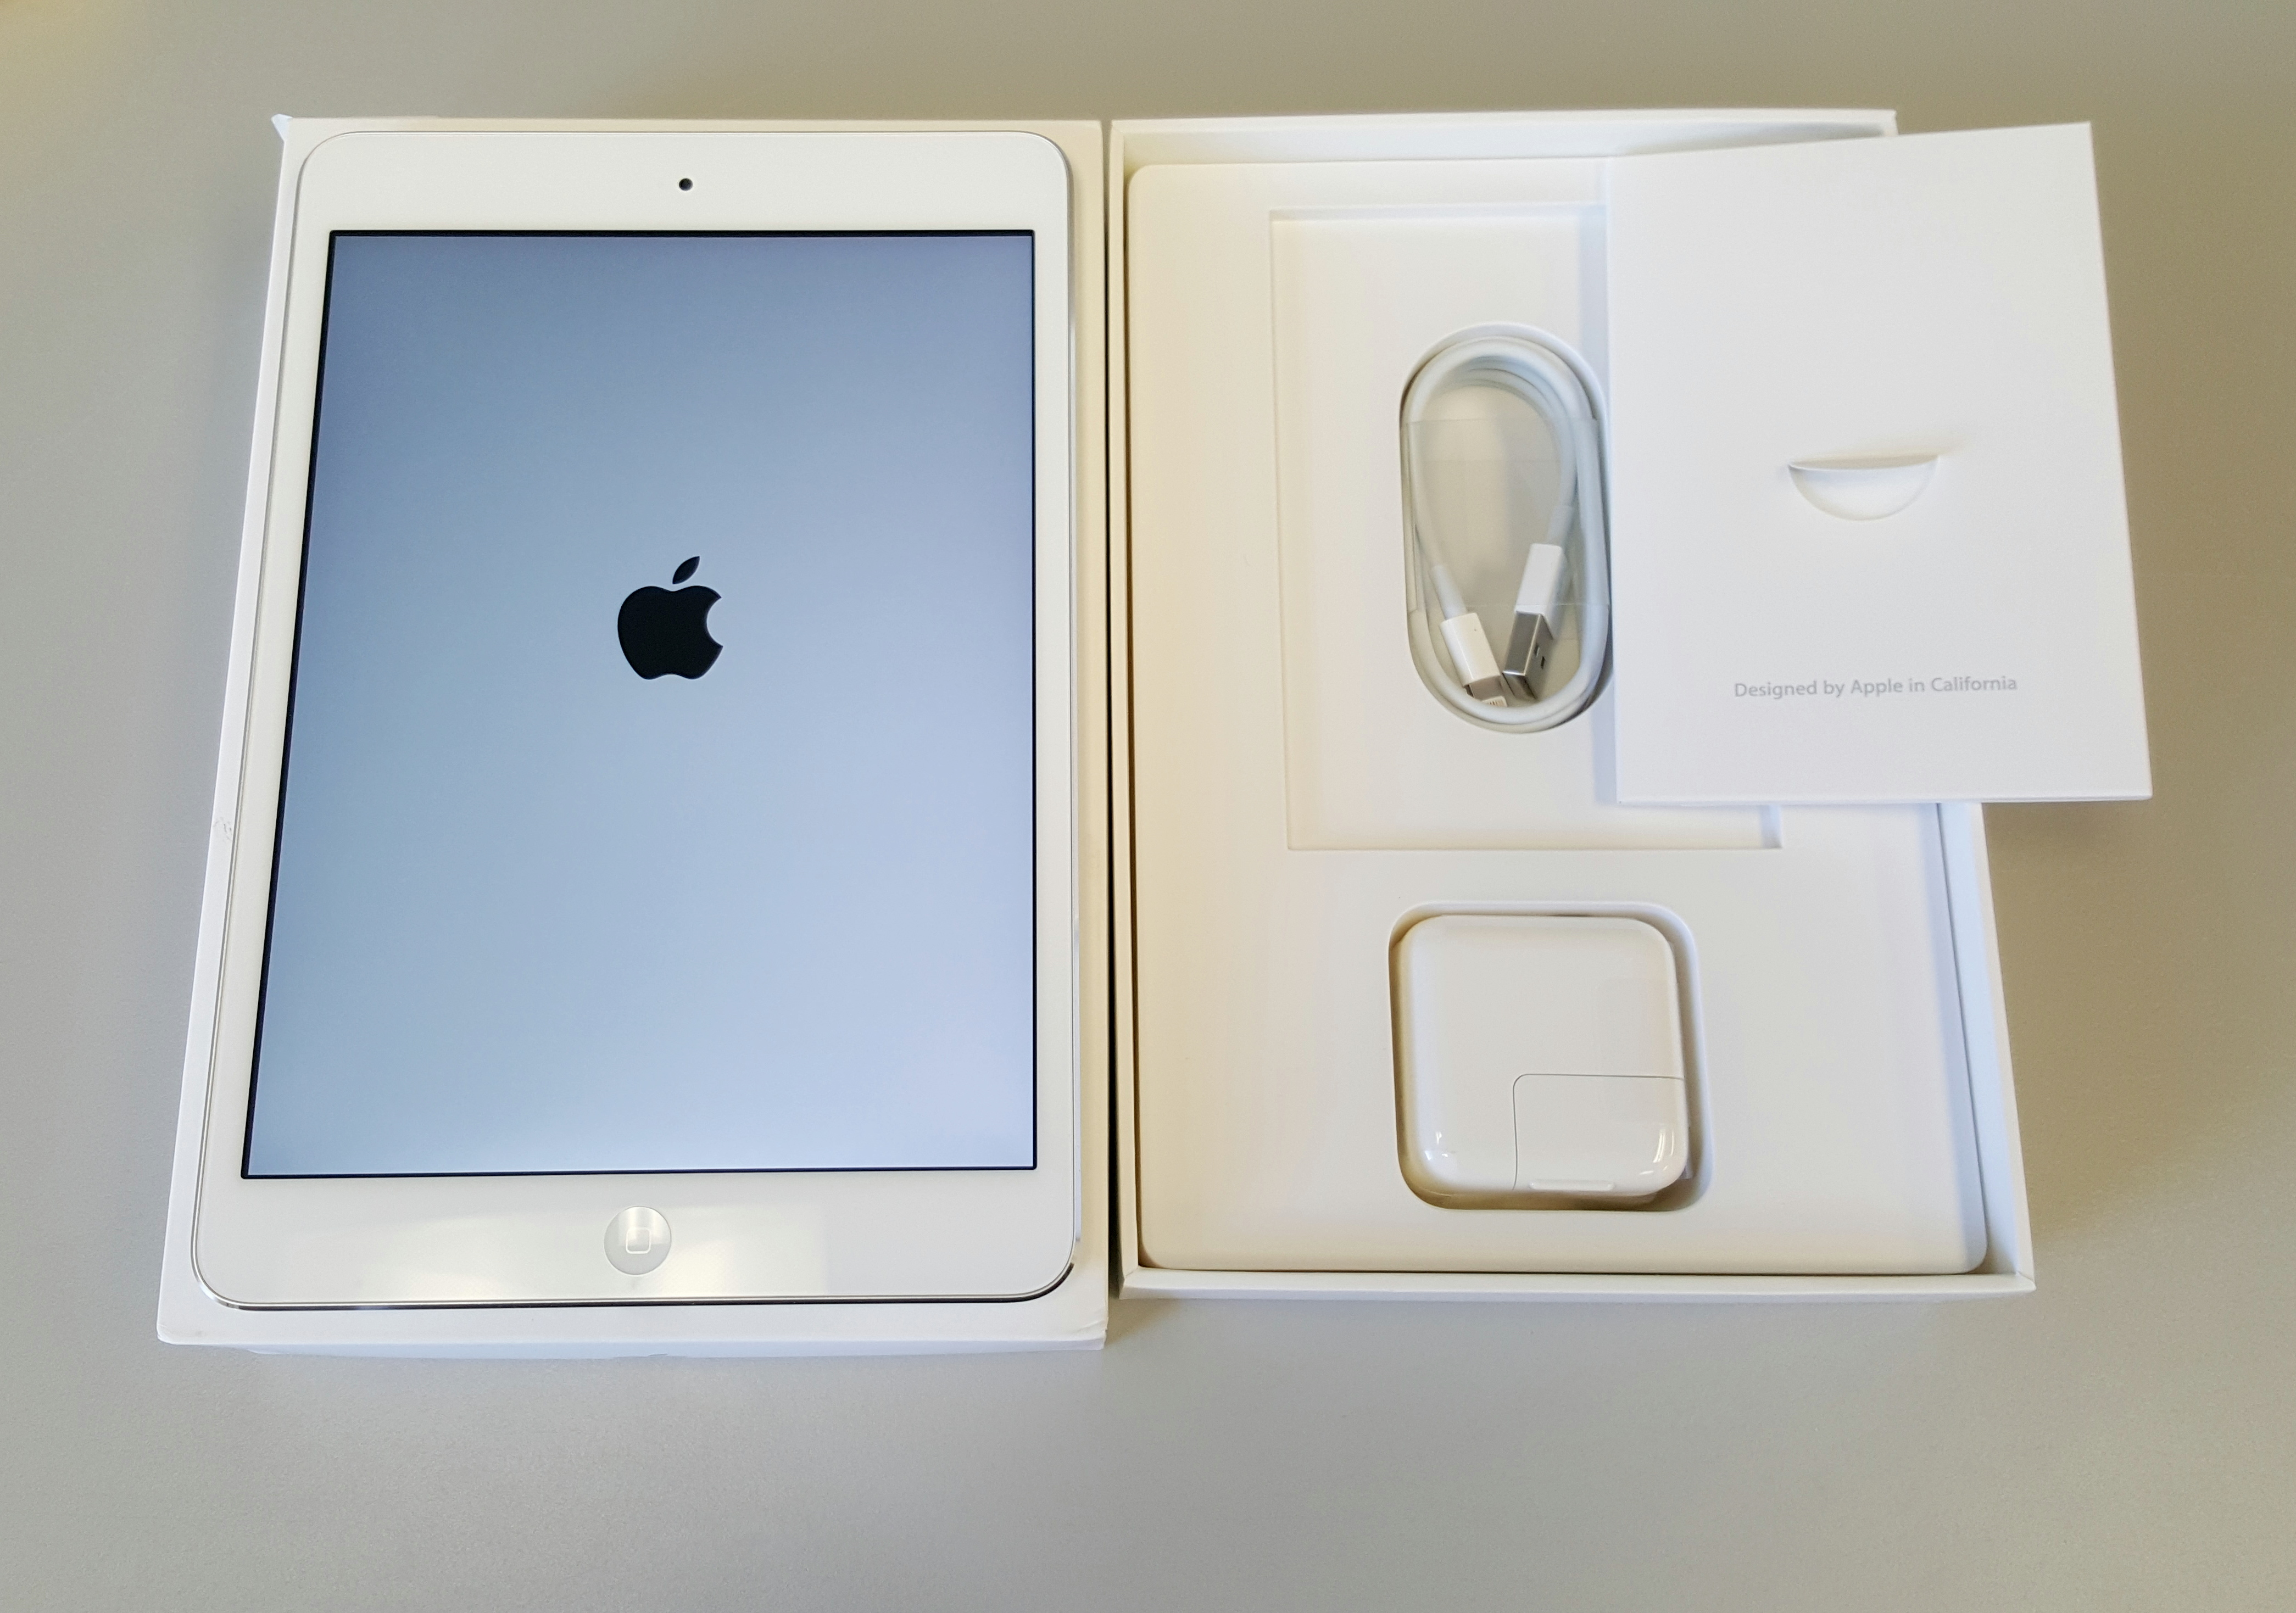 excellent apple ipad mini 2 2nd gen 7 9 32gb silver white. Black Bedroom Furniture Sets. Home Design Ideas